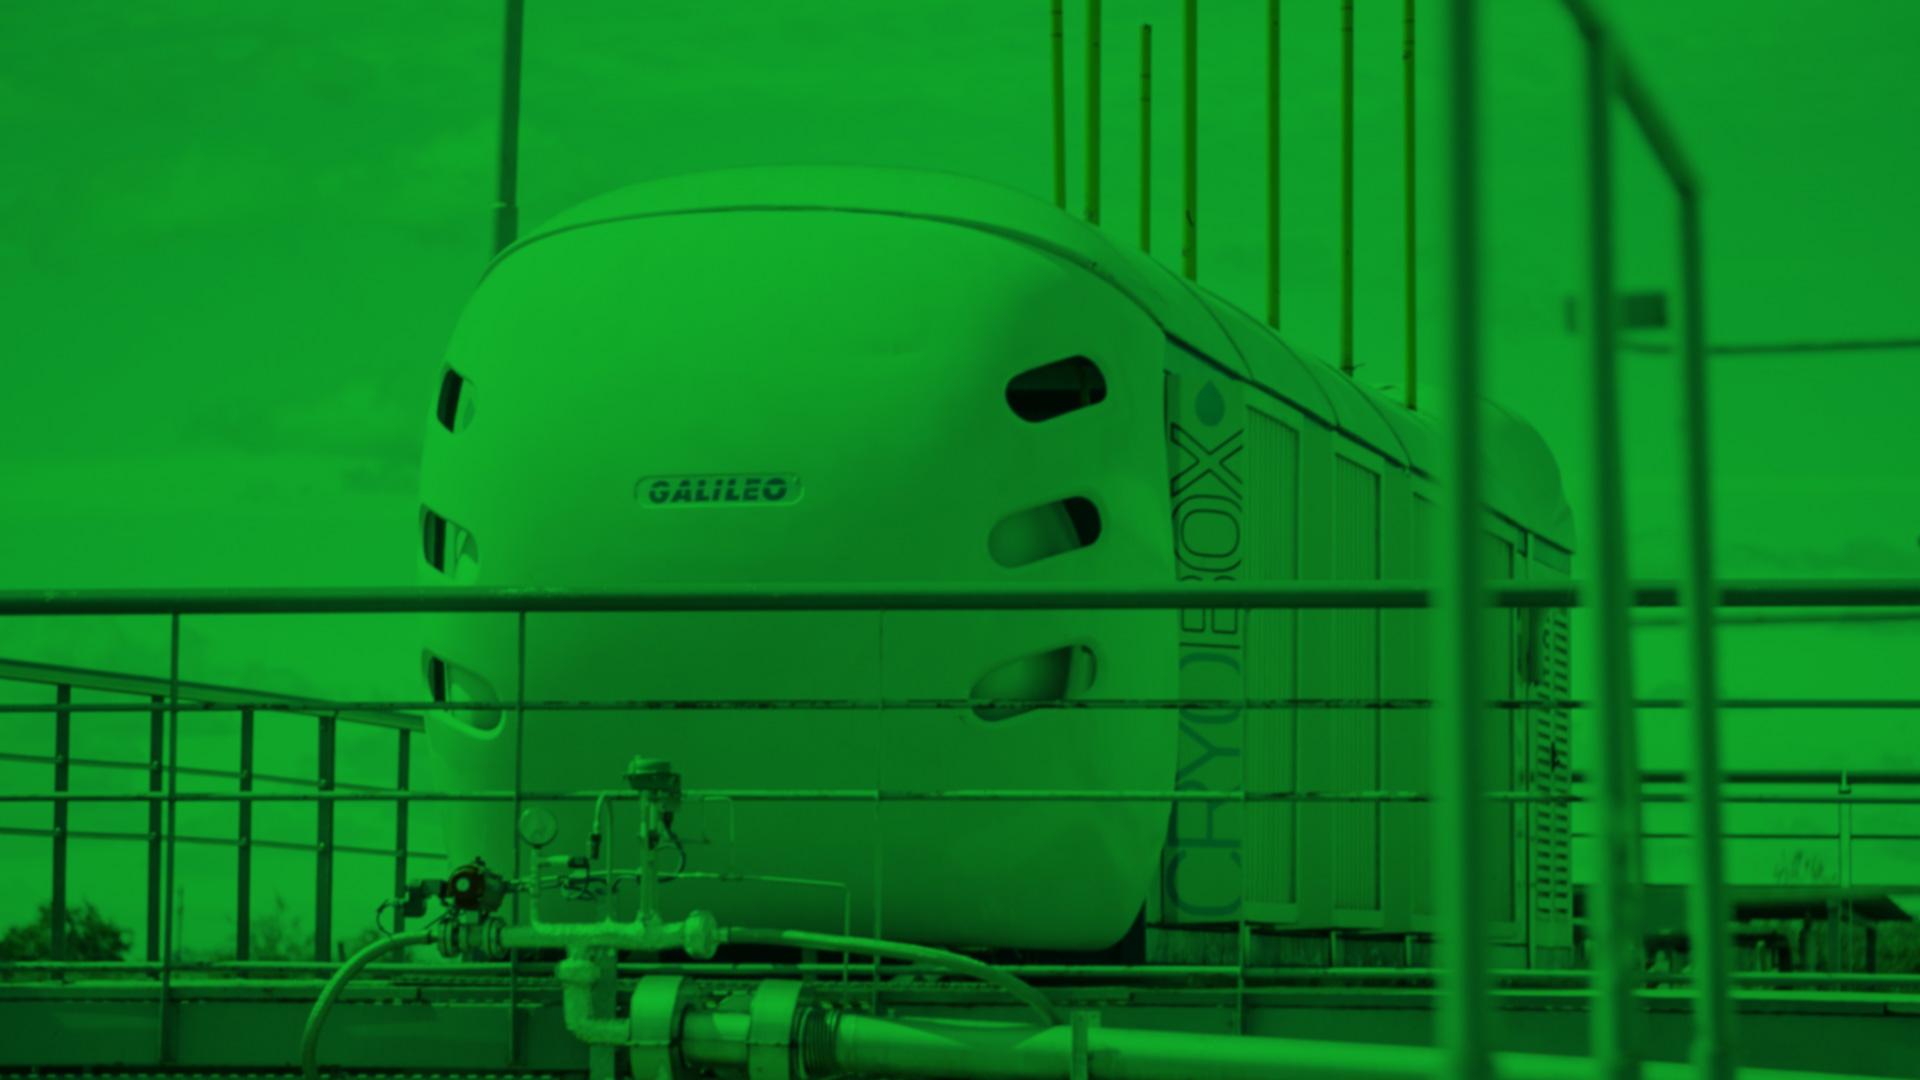 Biomethane Solutions - Galileo Technologies - Bio-LNG and Bio-CNG